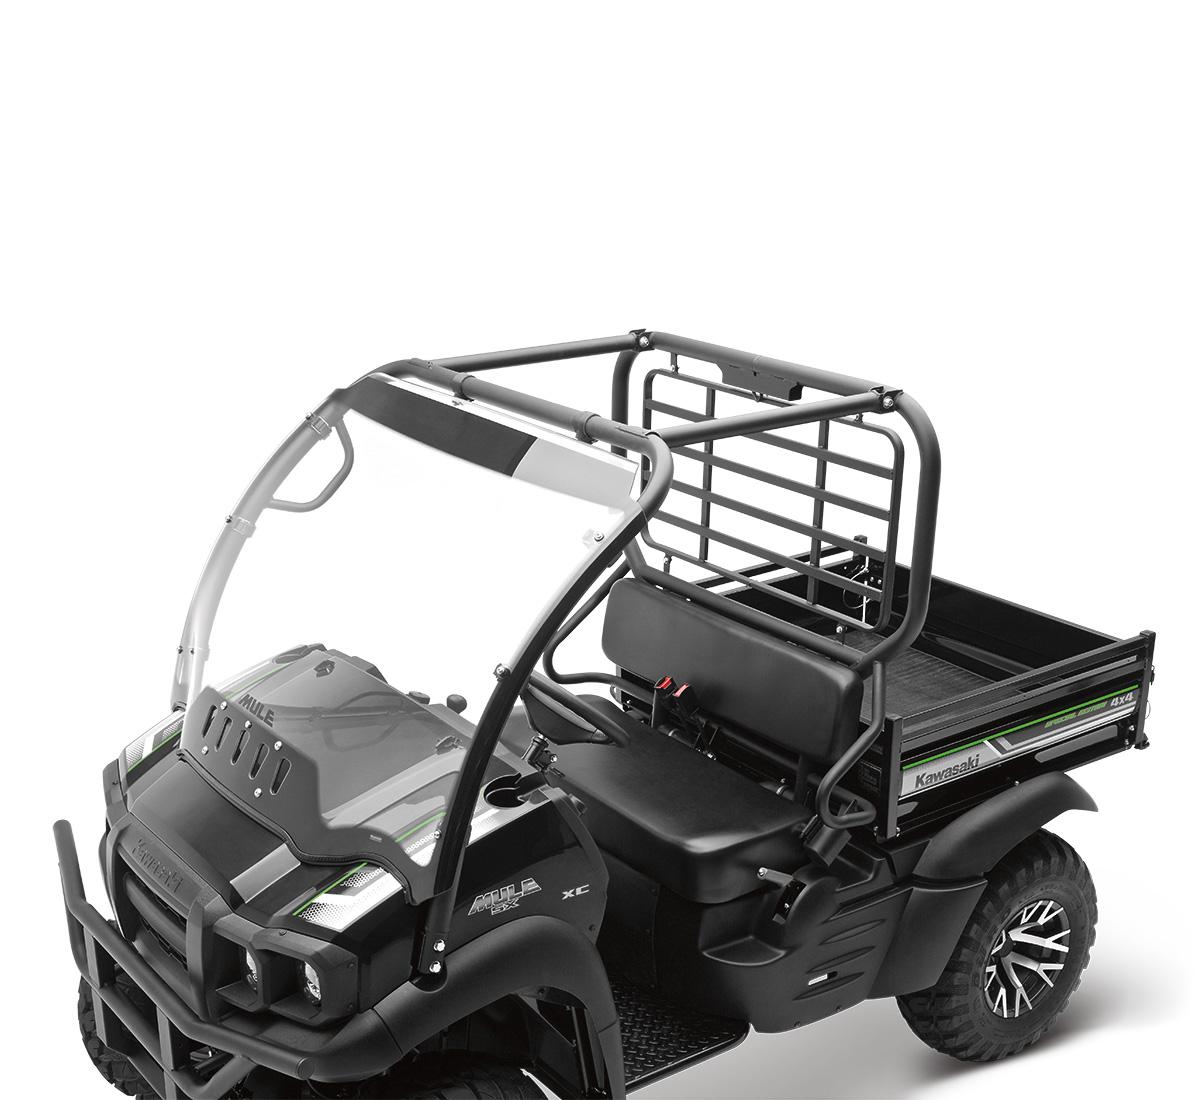 2017 mule sx™ 4x4 mule sx™ side x sidekawasaki